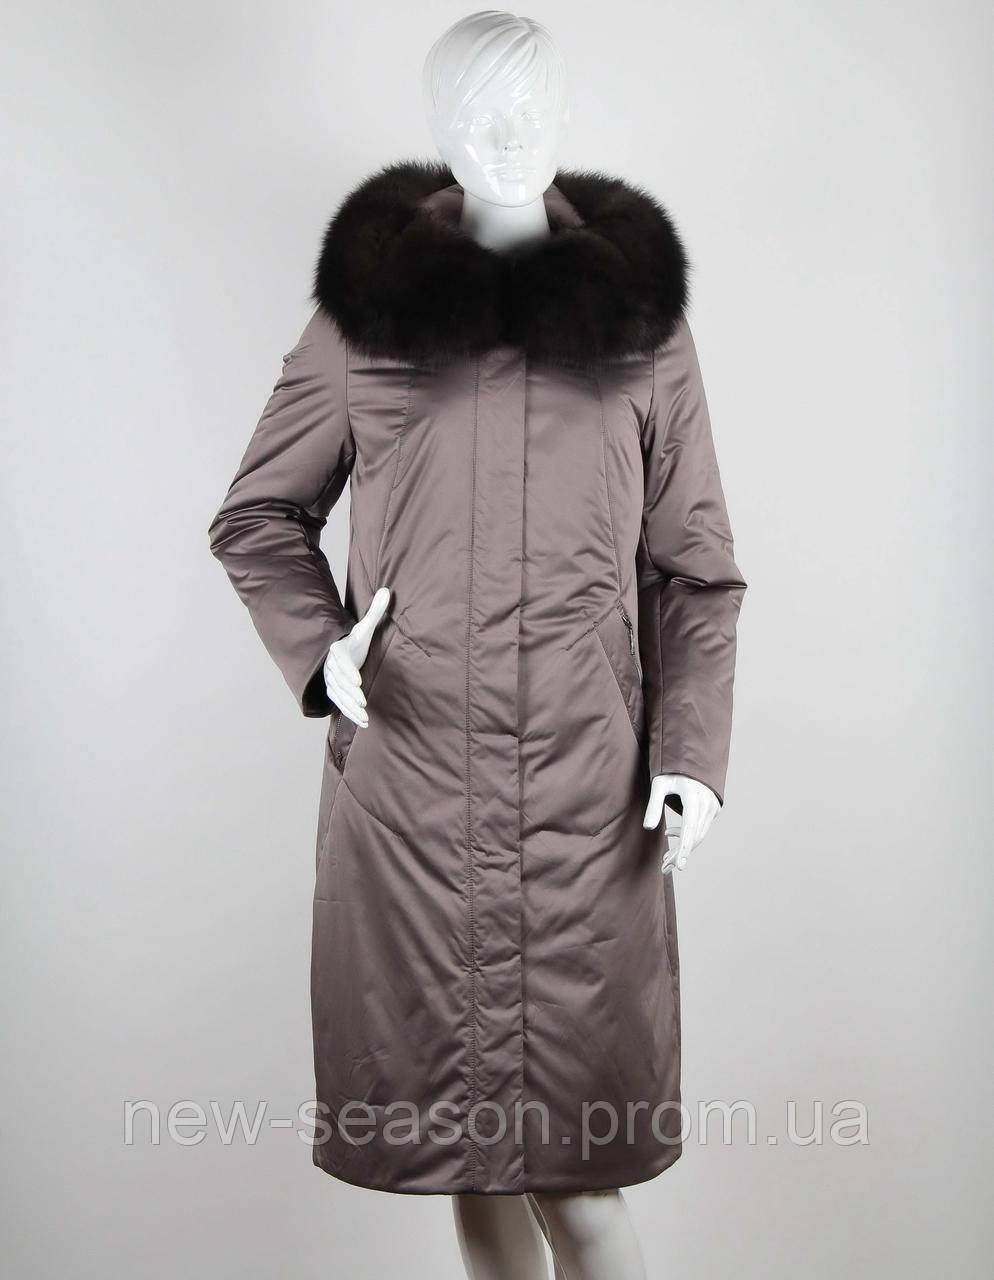 Пальто Klasika Moda на верблюжьей шерсти 1989-5-L капучино